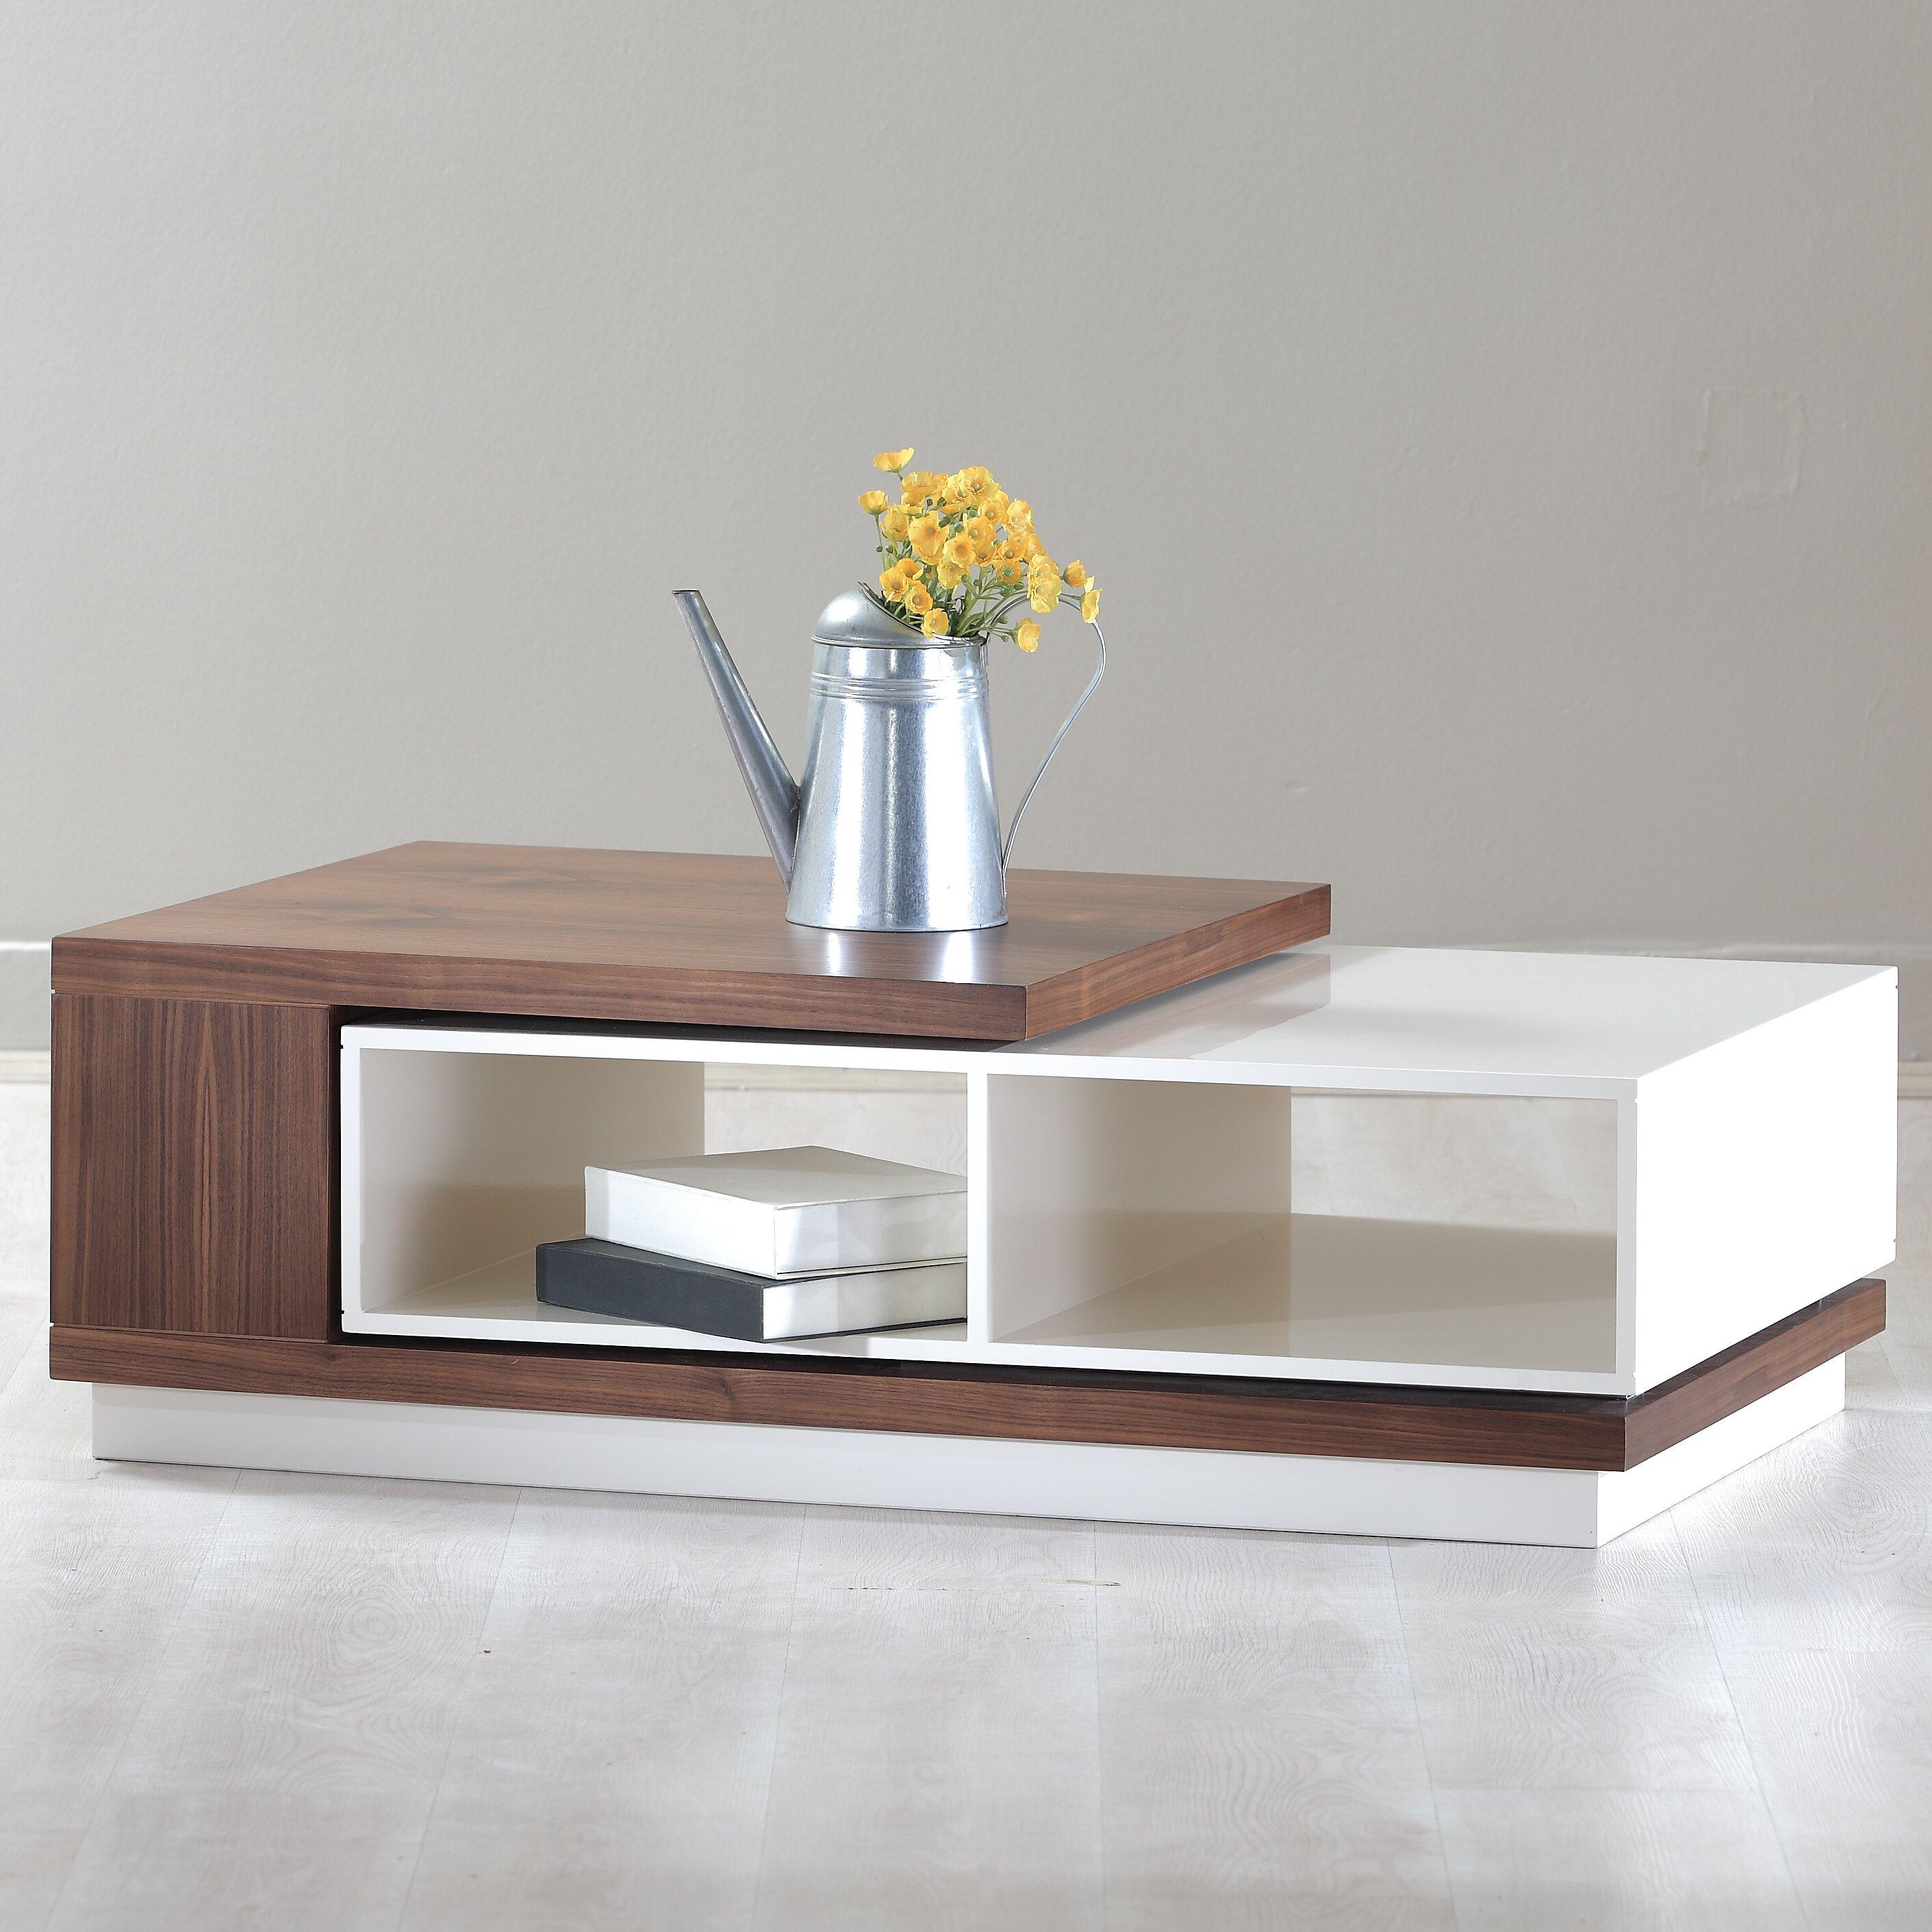 la viola d cor 213 plus zoom coffee table reviews wayfair. Black Bedroom Furniture Sets. Home Design Ideas